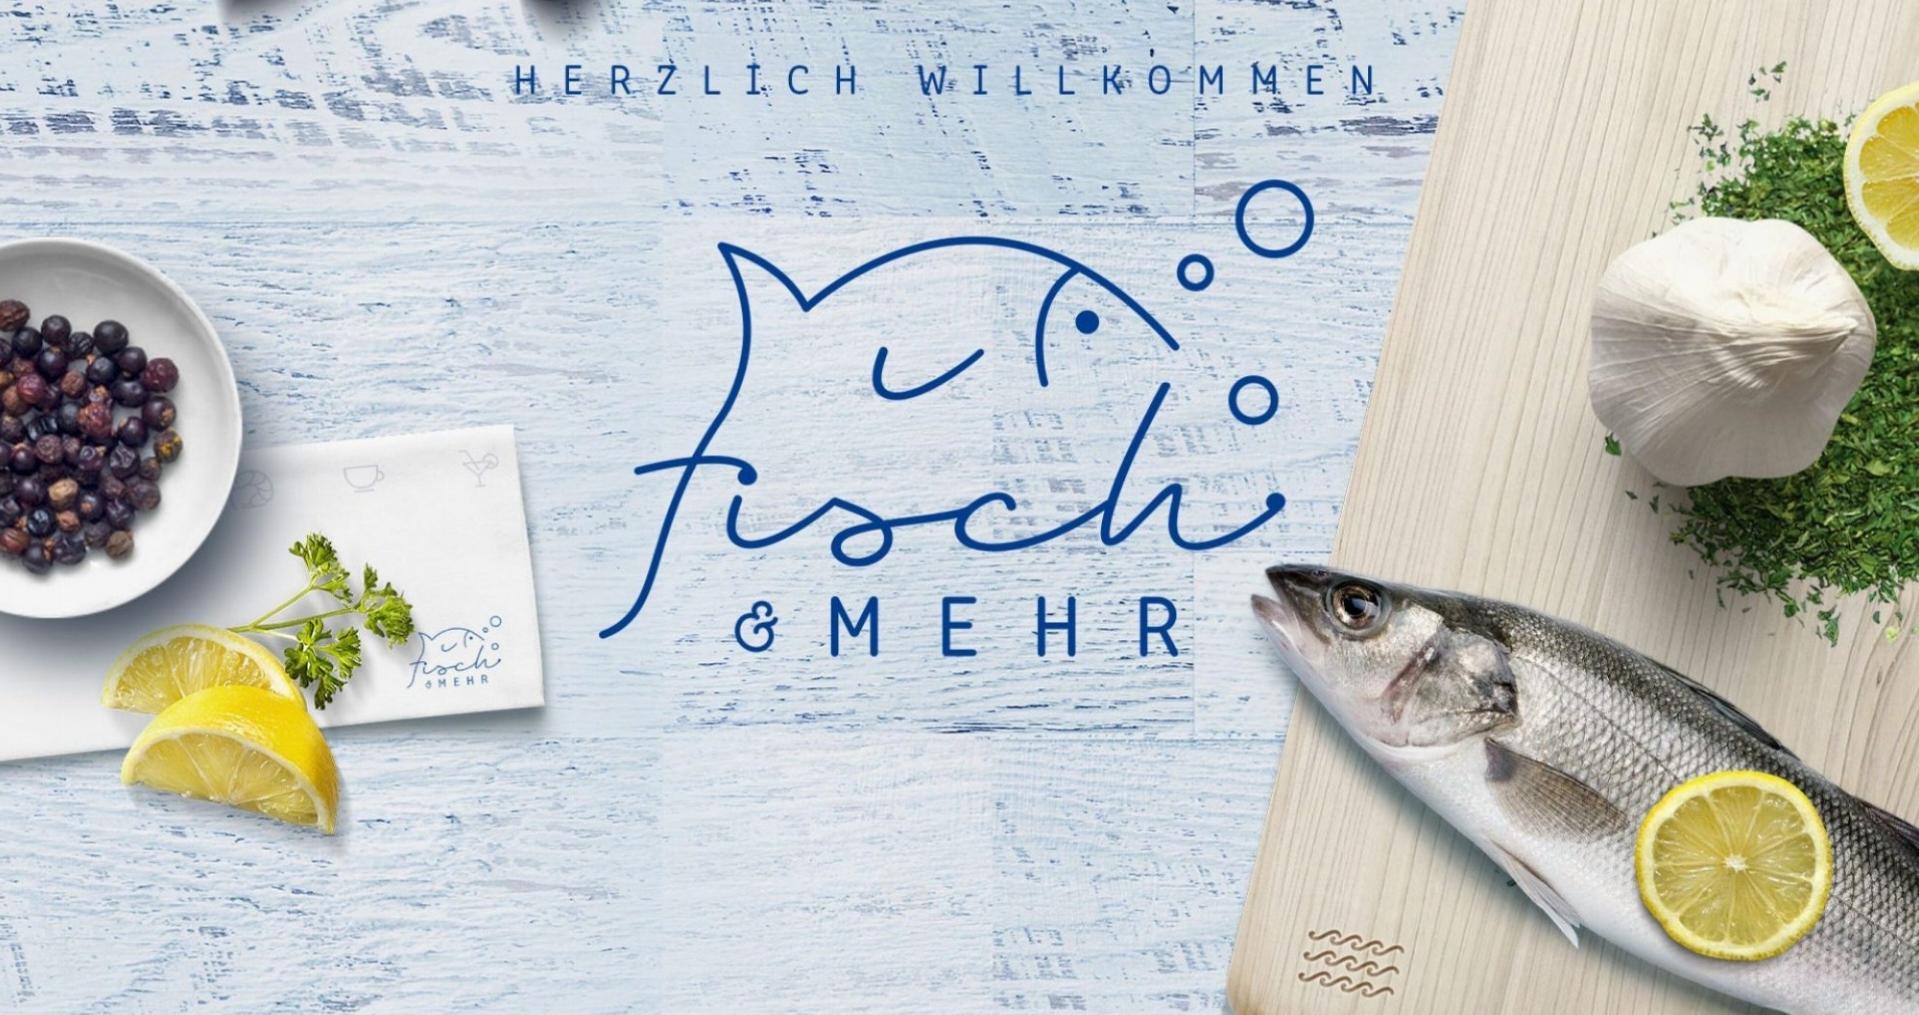 http://fischundmehr-kiel.de/